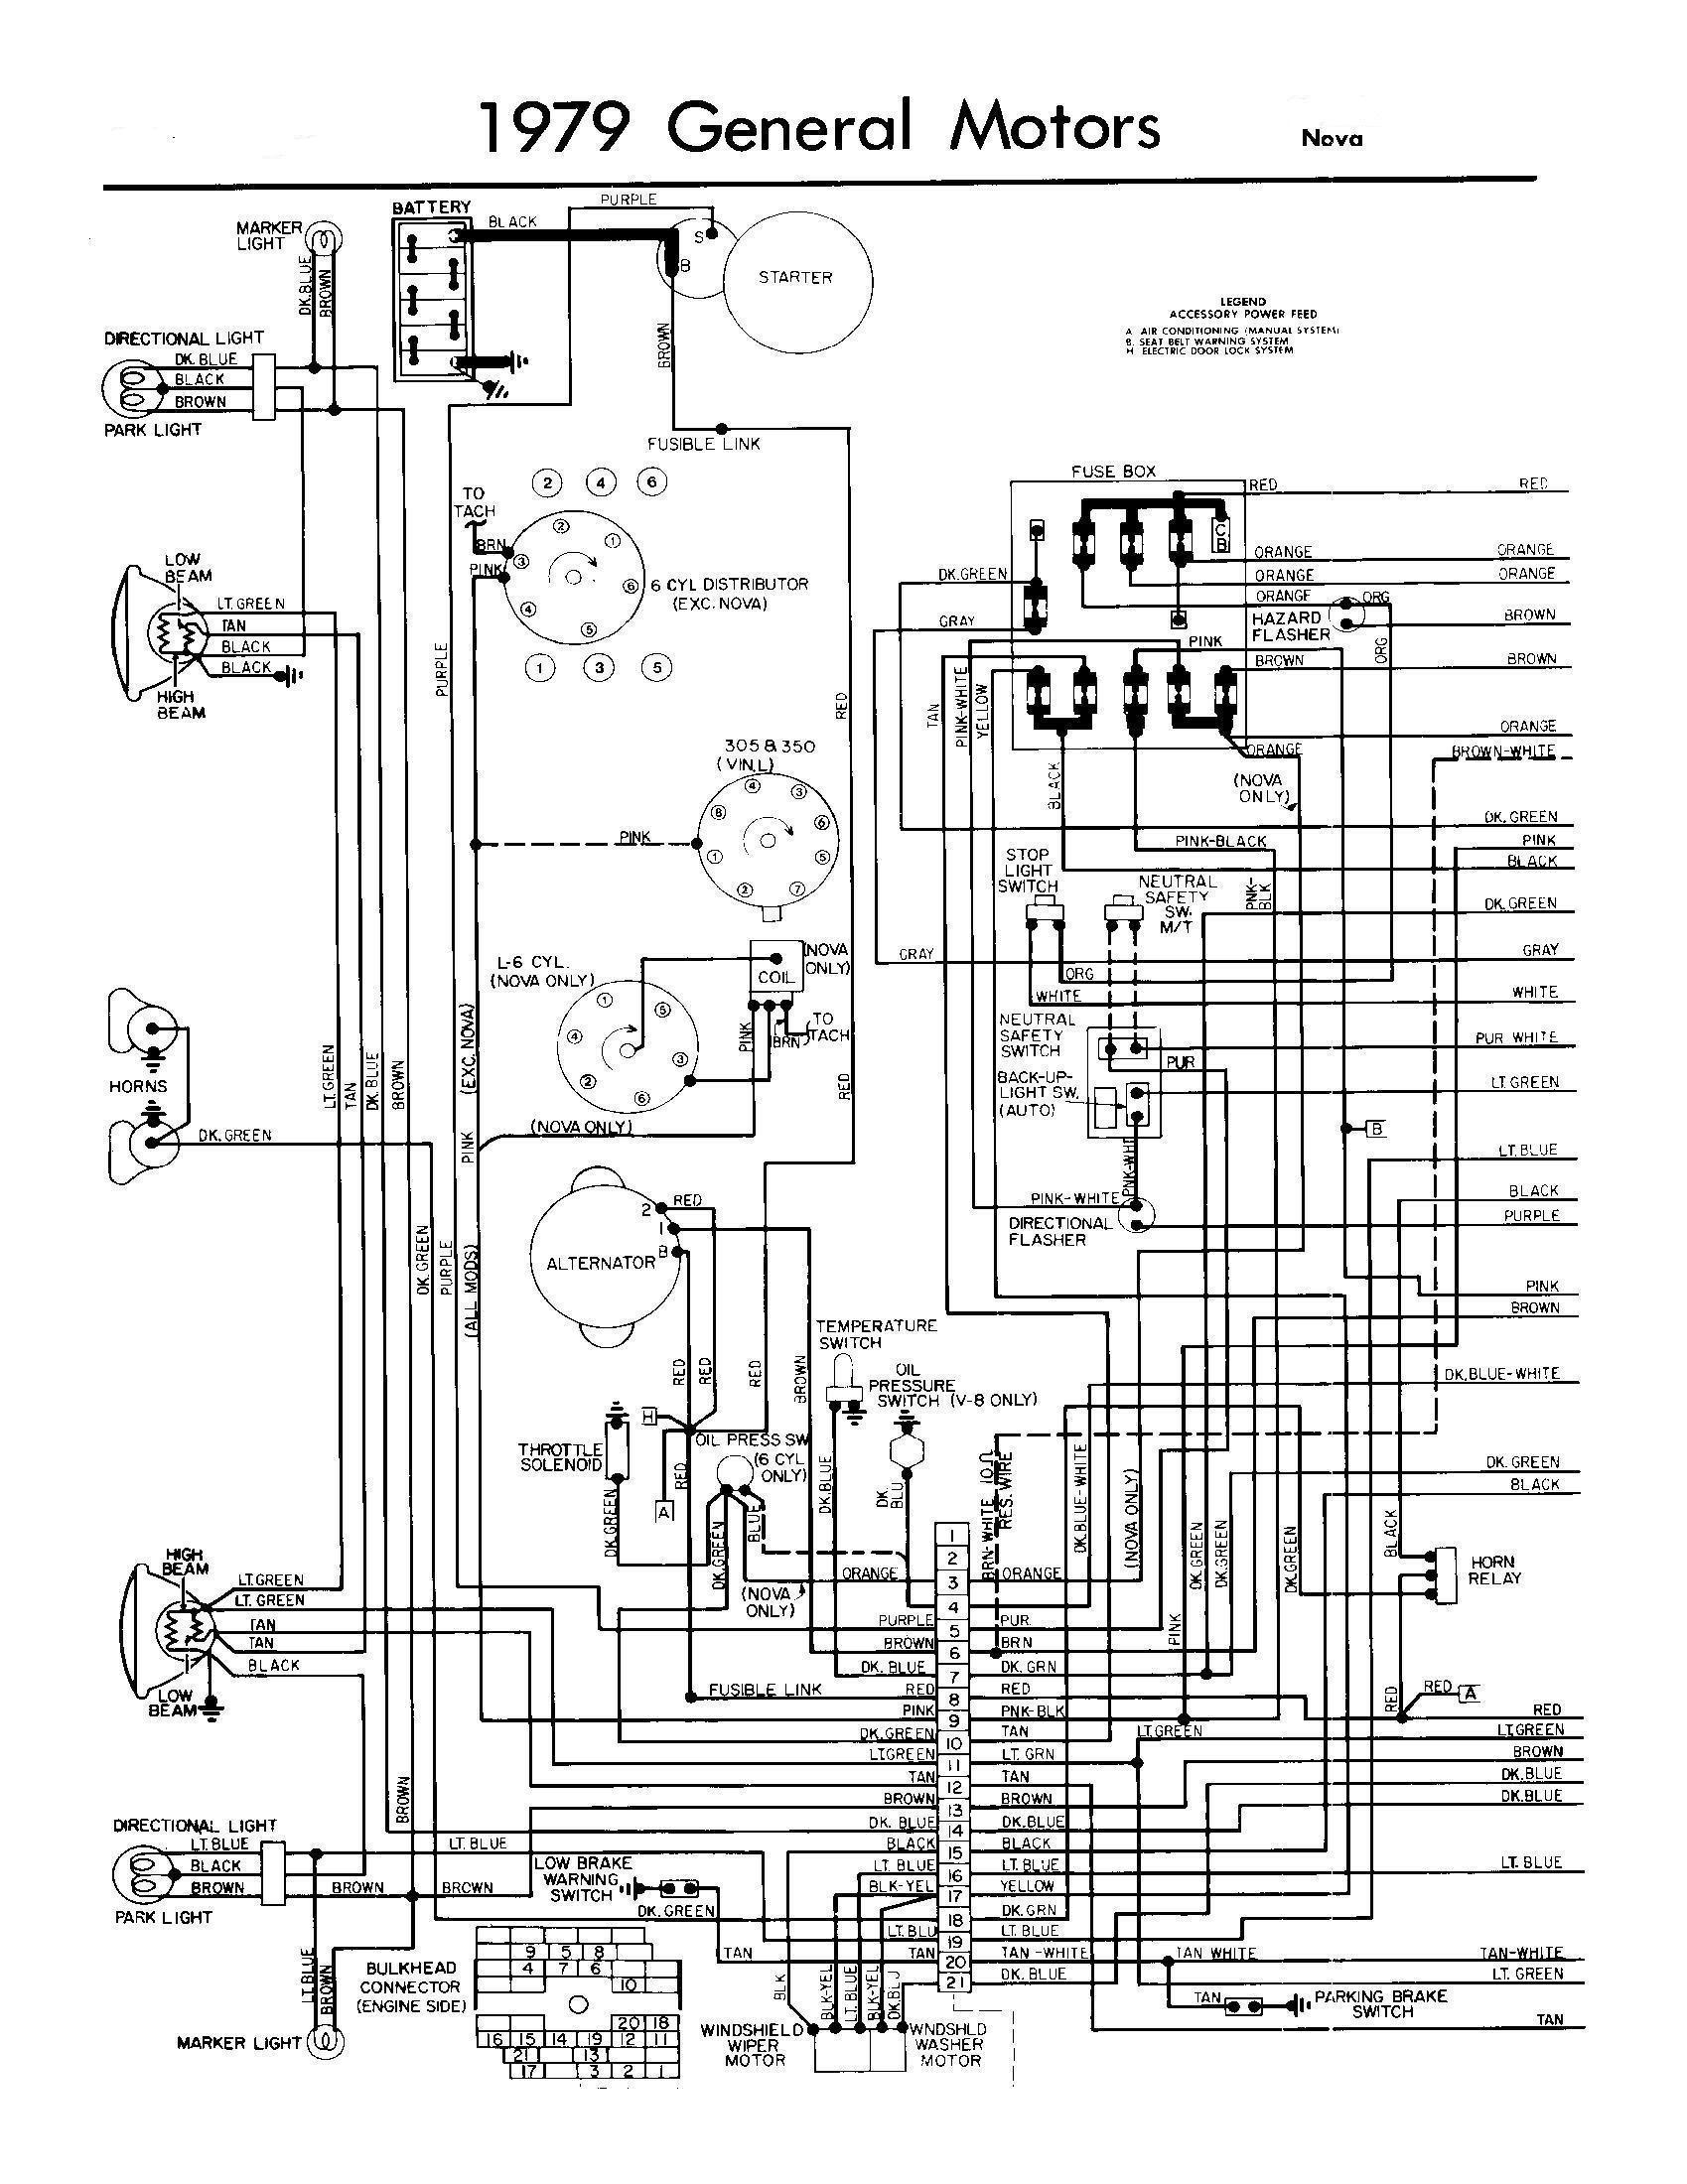 Remarkable Trans Am Wiring Diagram Basic Electronics Wiring Diagram Wiring Cloud Eachirenstrafr09Org